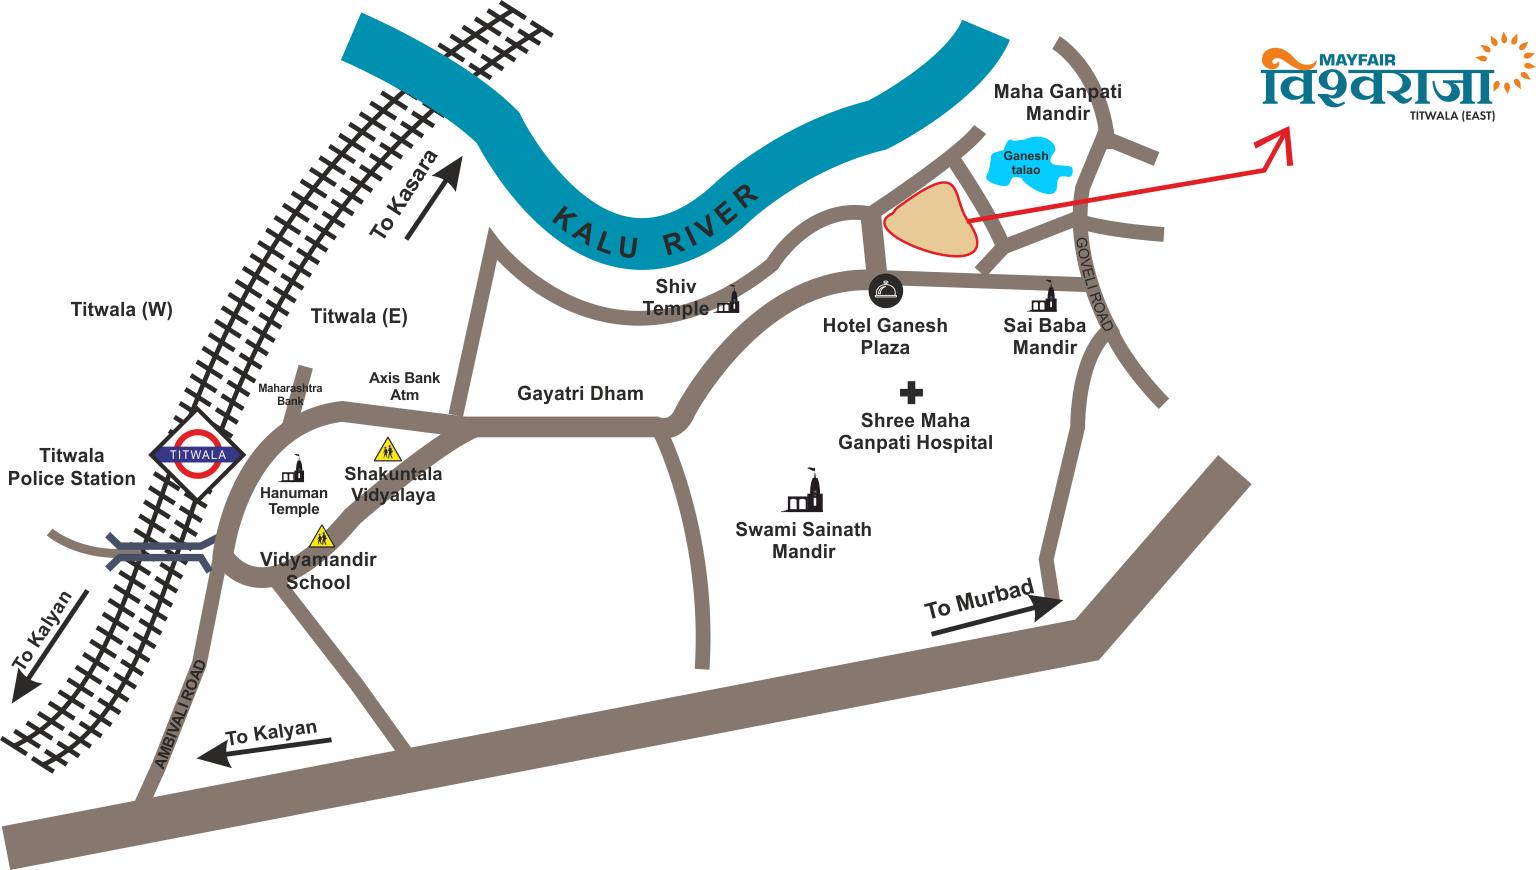 Mayfair VishwarajaLocation Map